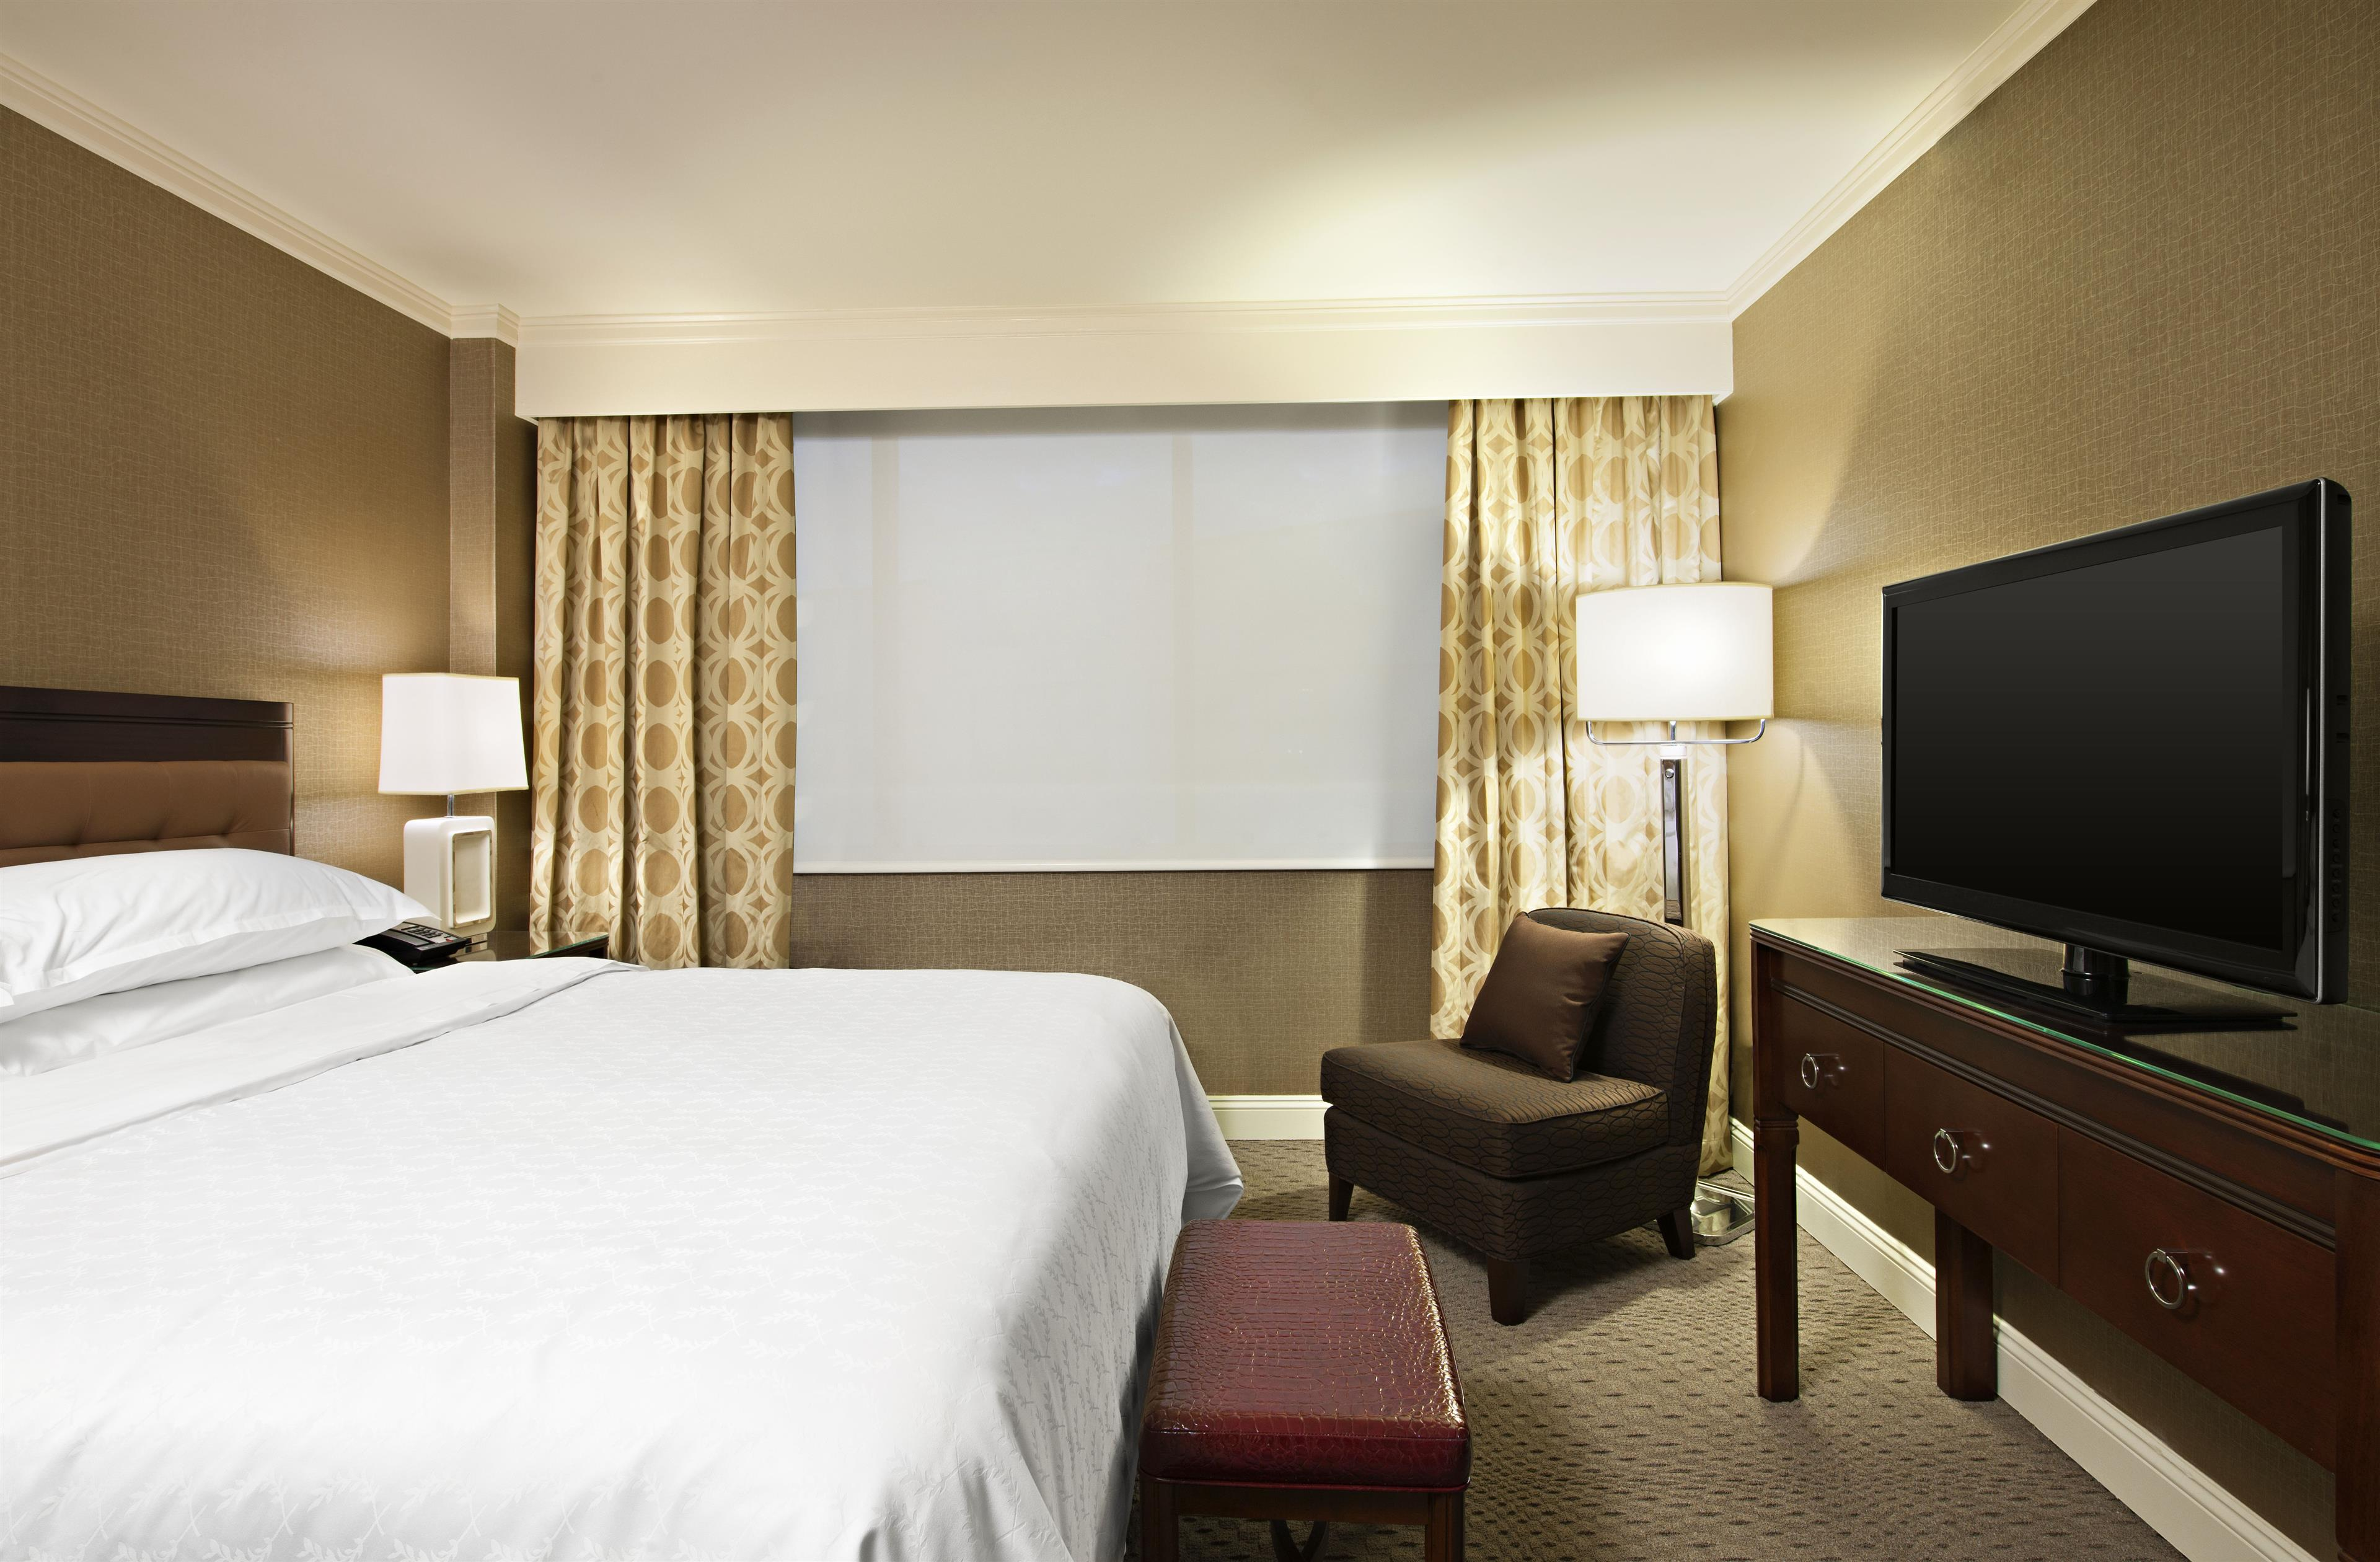 Sheraton Wilmington South Hotel image 7